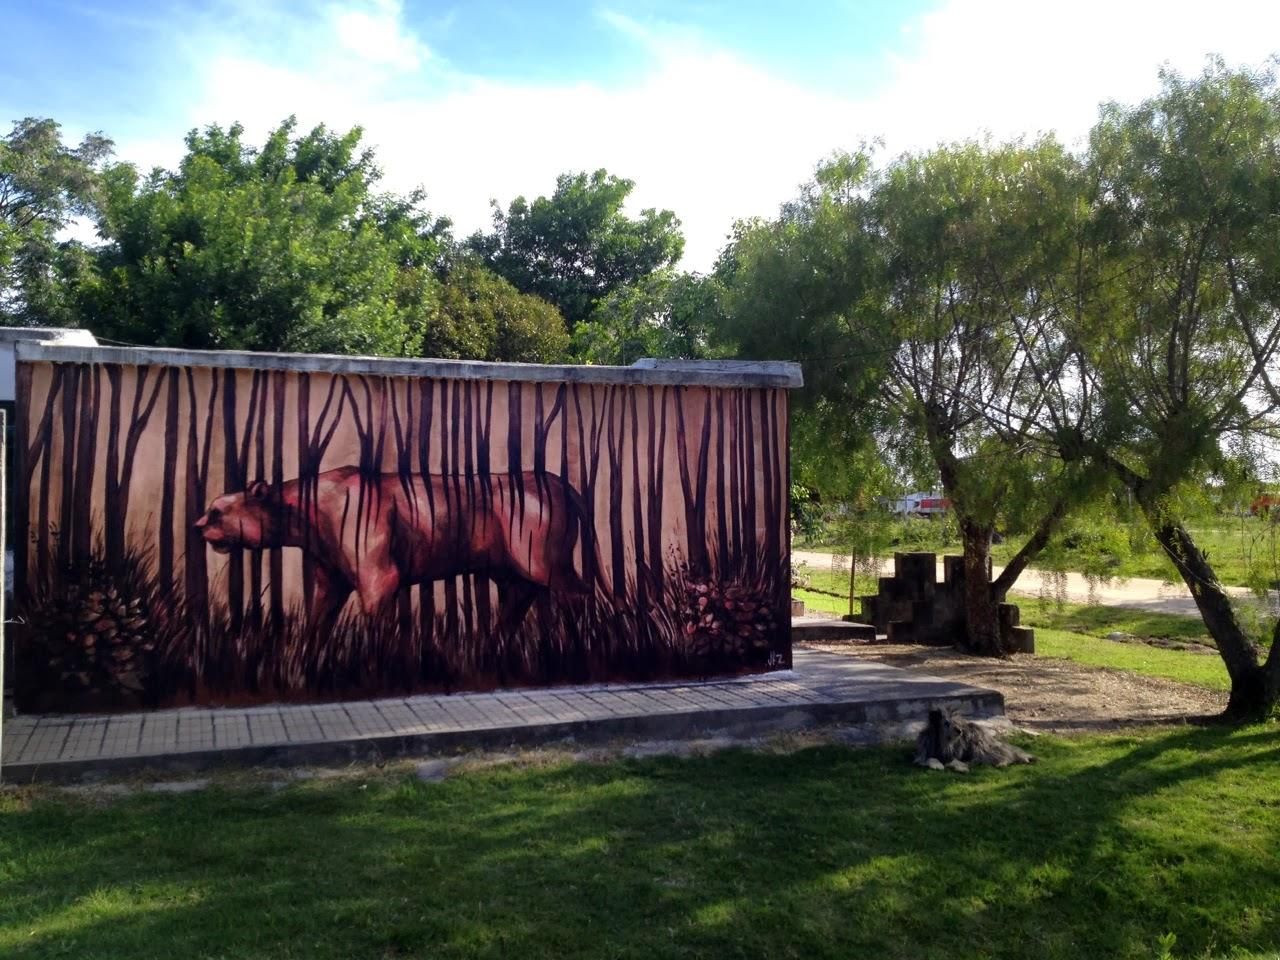 jaz-new-mural-villa-soriano-uruguay-02